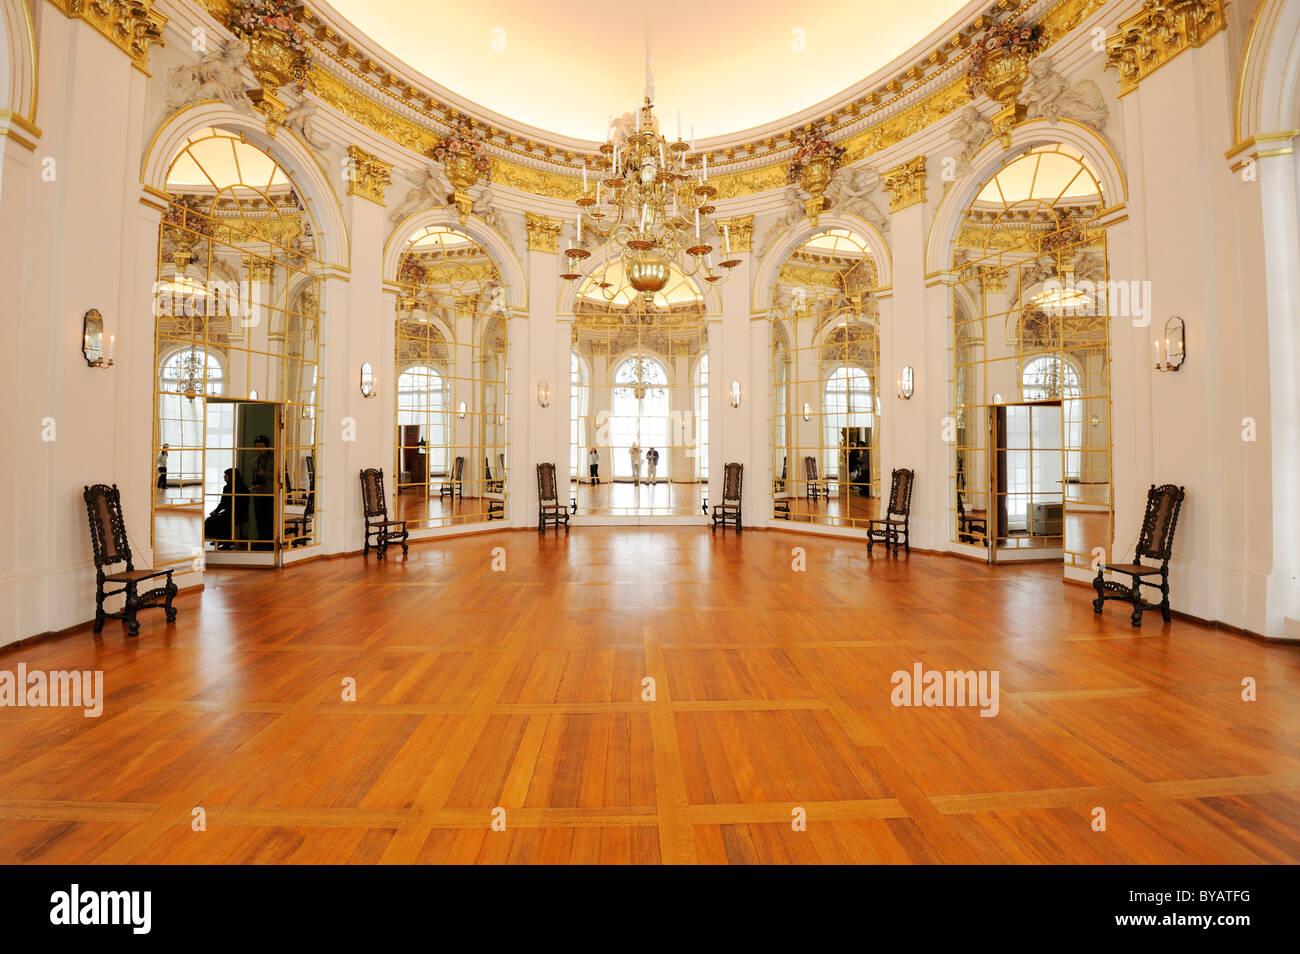 Oval room in schloss charlottenburg palace berlin for Lampen charlottenburg